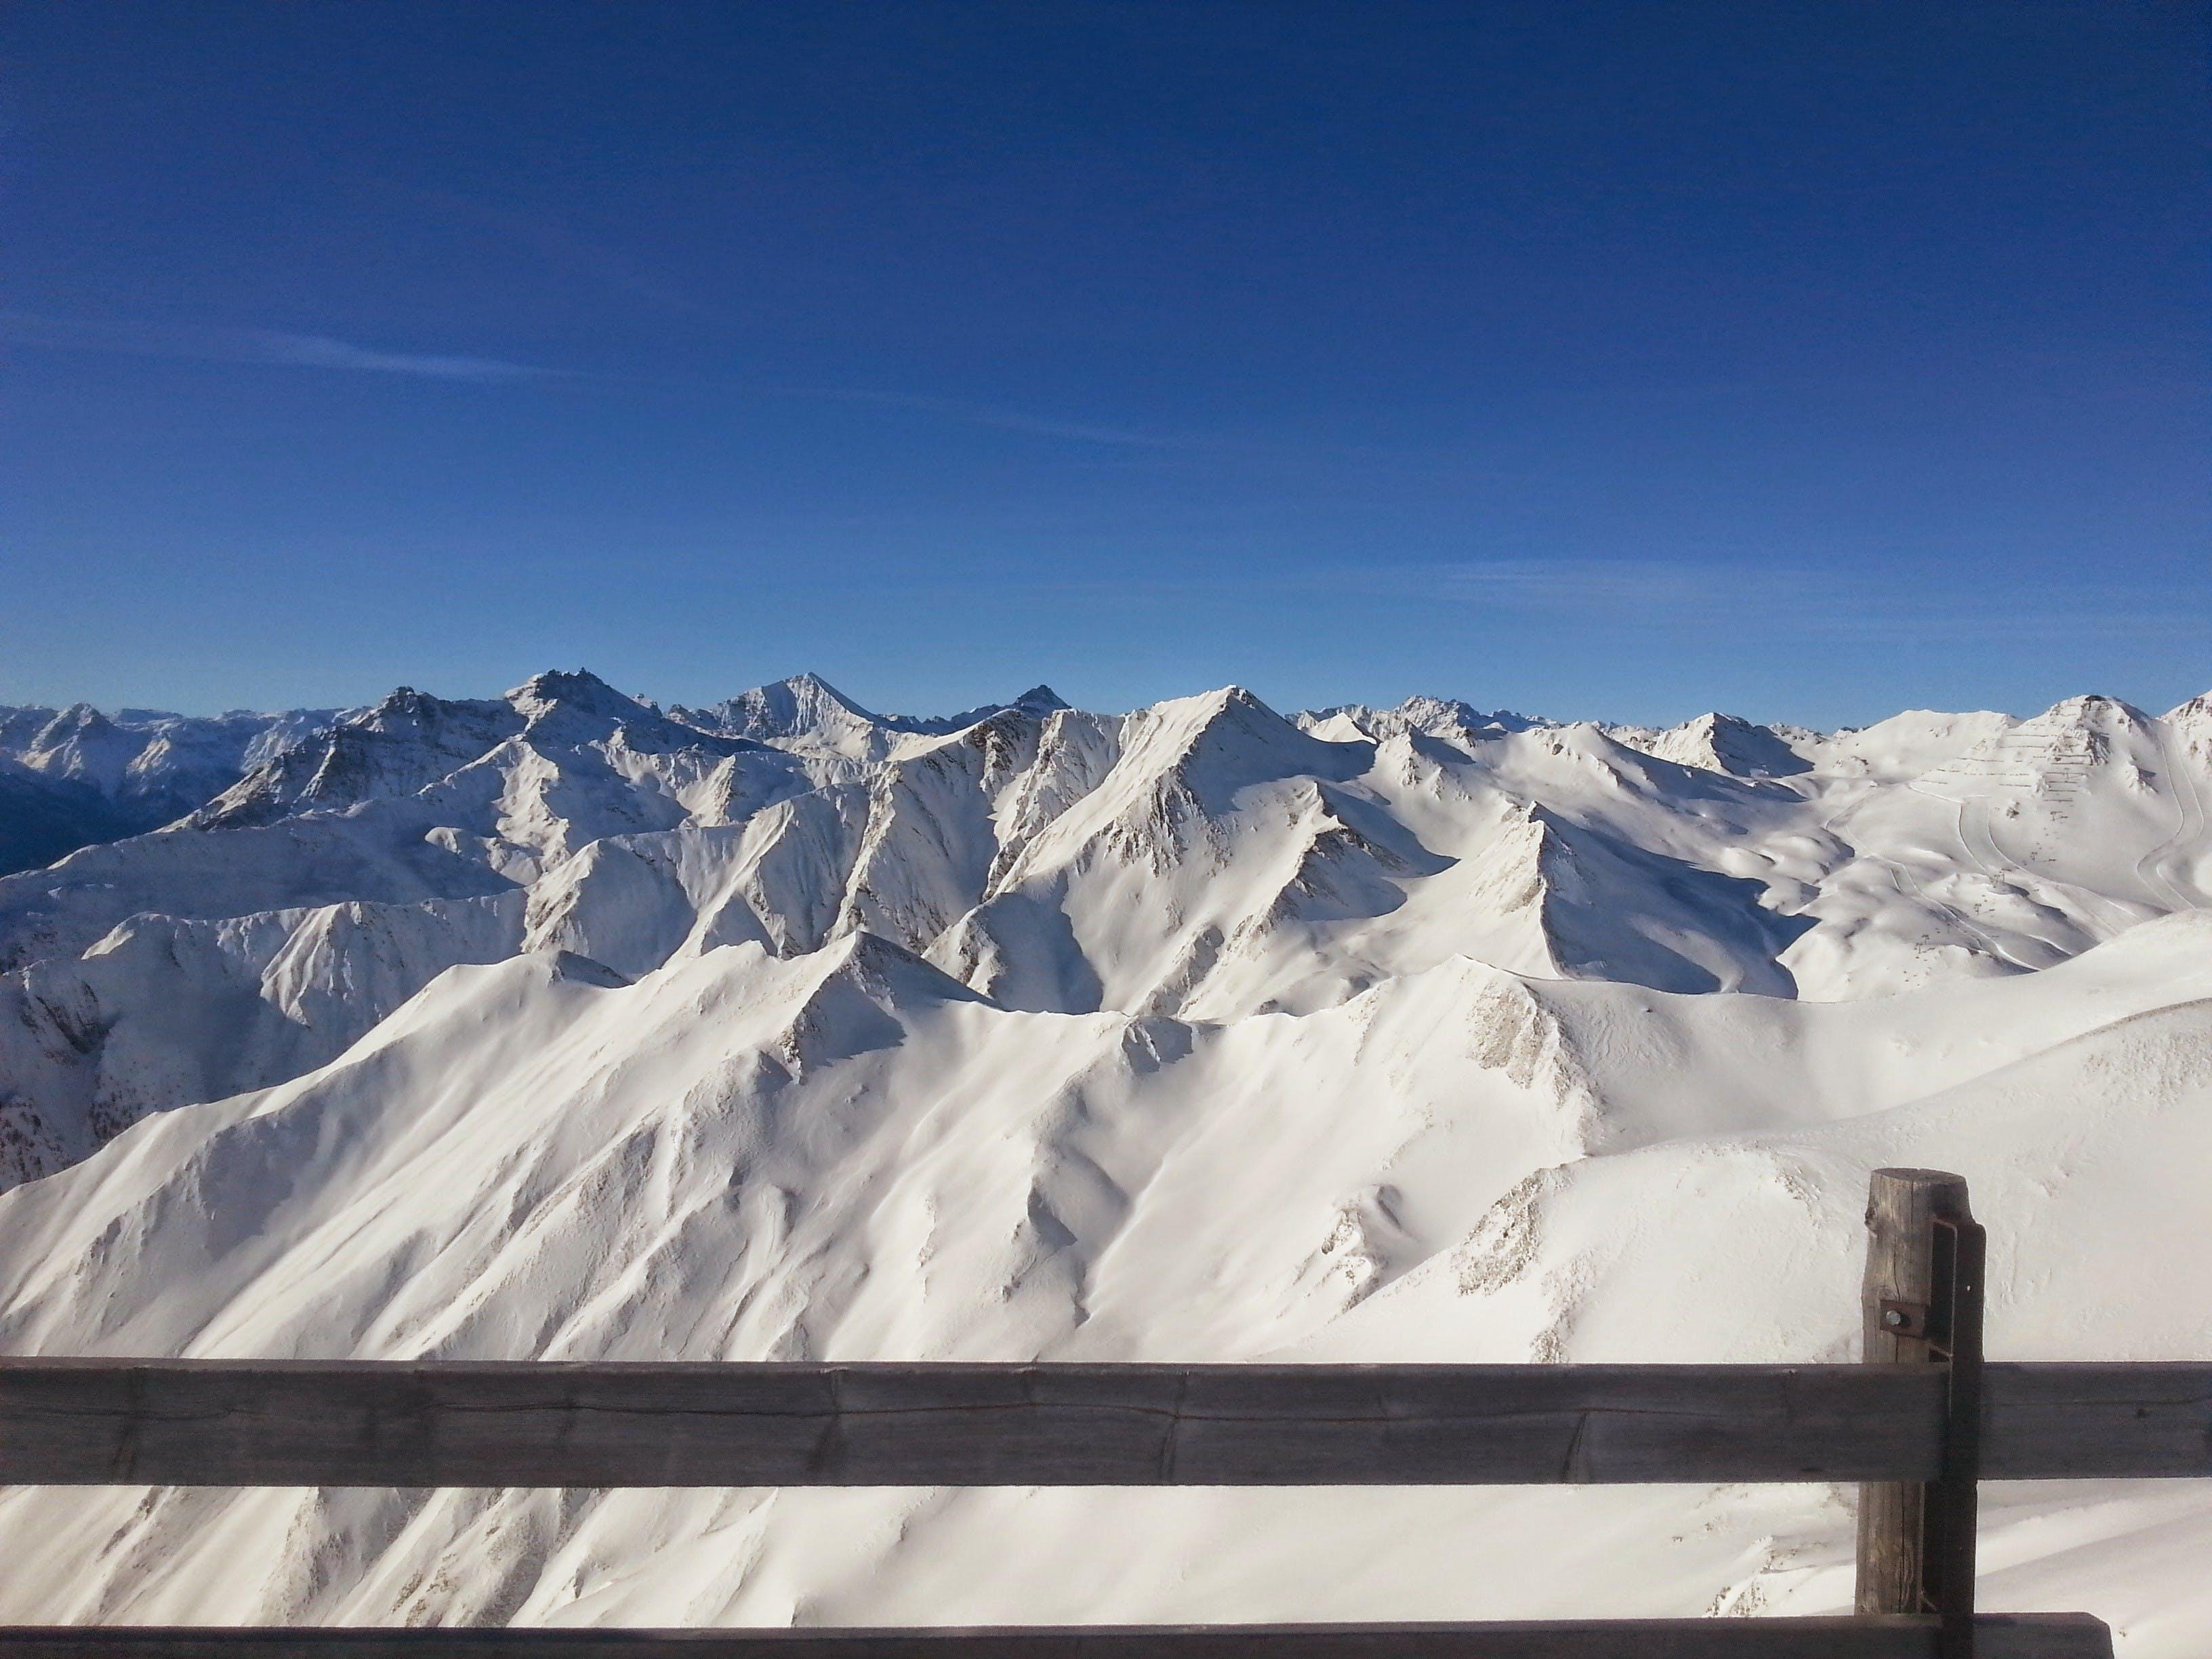 Top Veiw Photo of a Snowy Mountain